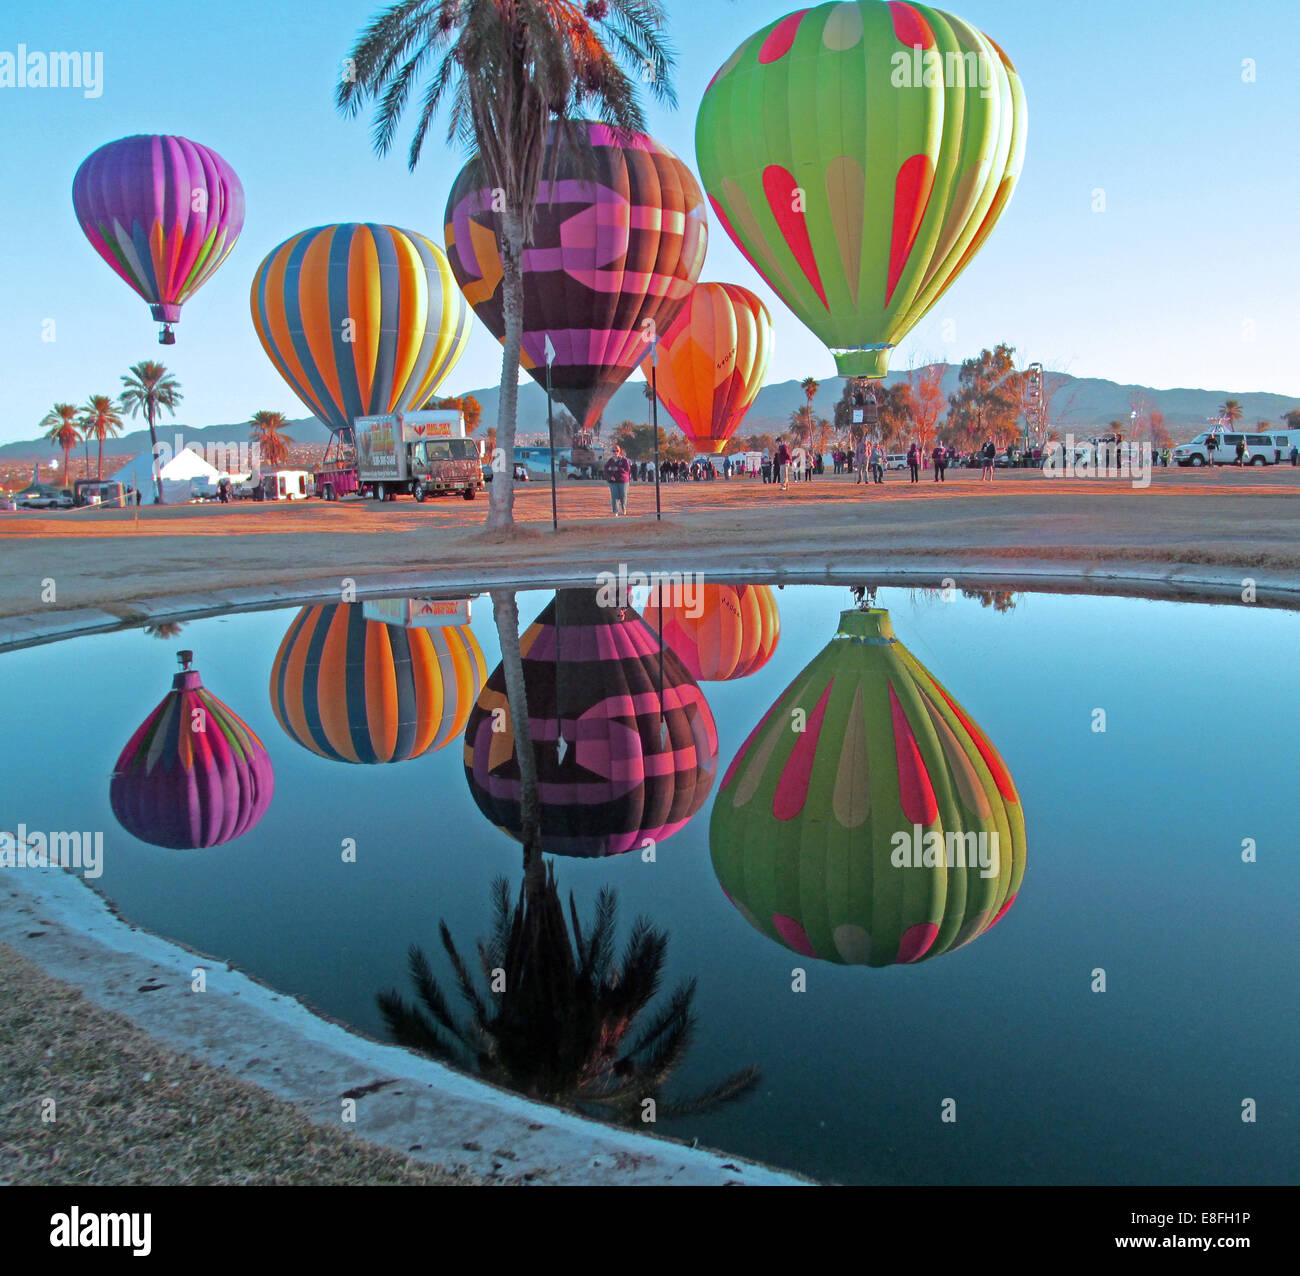 USA, Arizona, Mohave County, Lake Havasu City, Beachcomber Boulevard, Lake Havasu, Lake Havasu Ballonfestival, Heißluftballons Stockbild